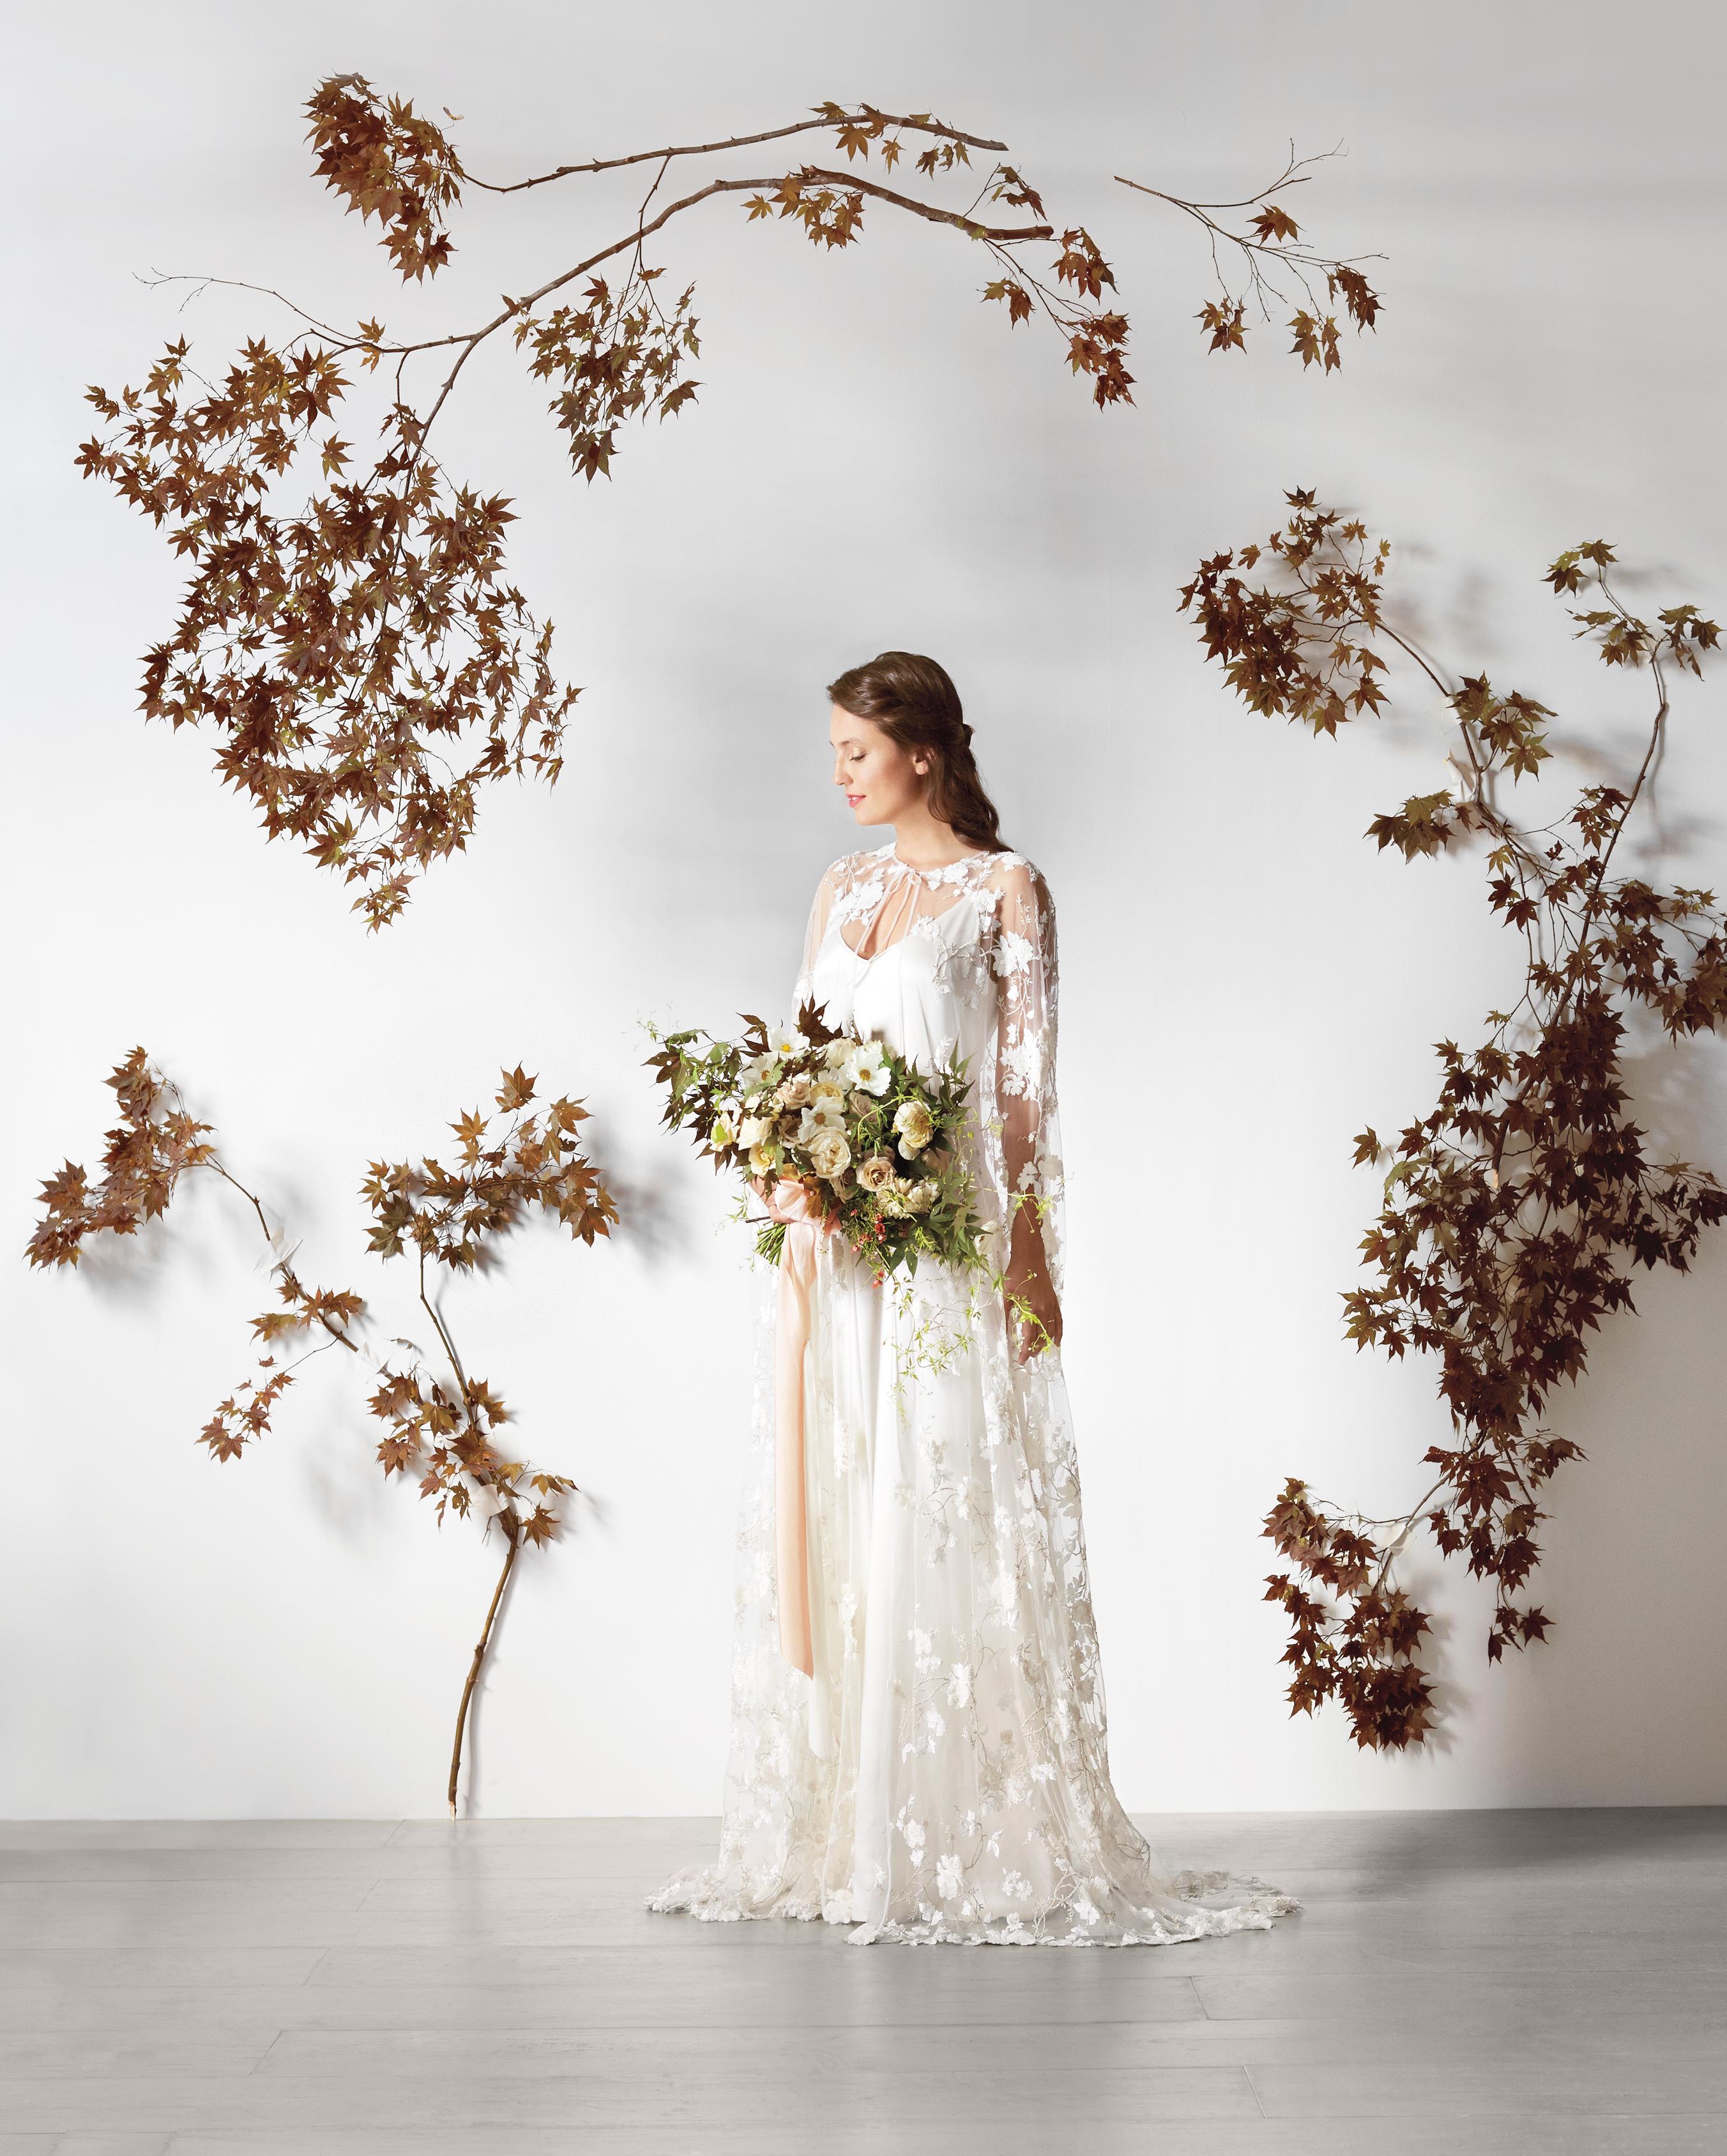 branch-ceremony-marker-bride-158-d111585-comp.jpg